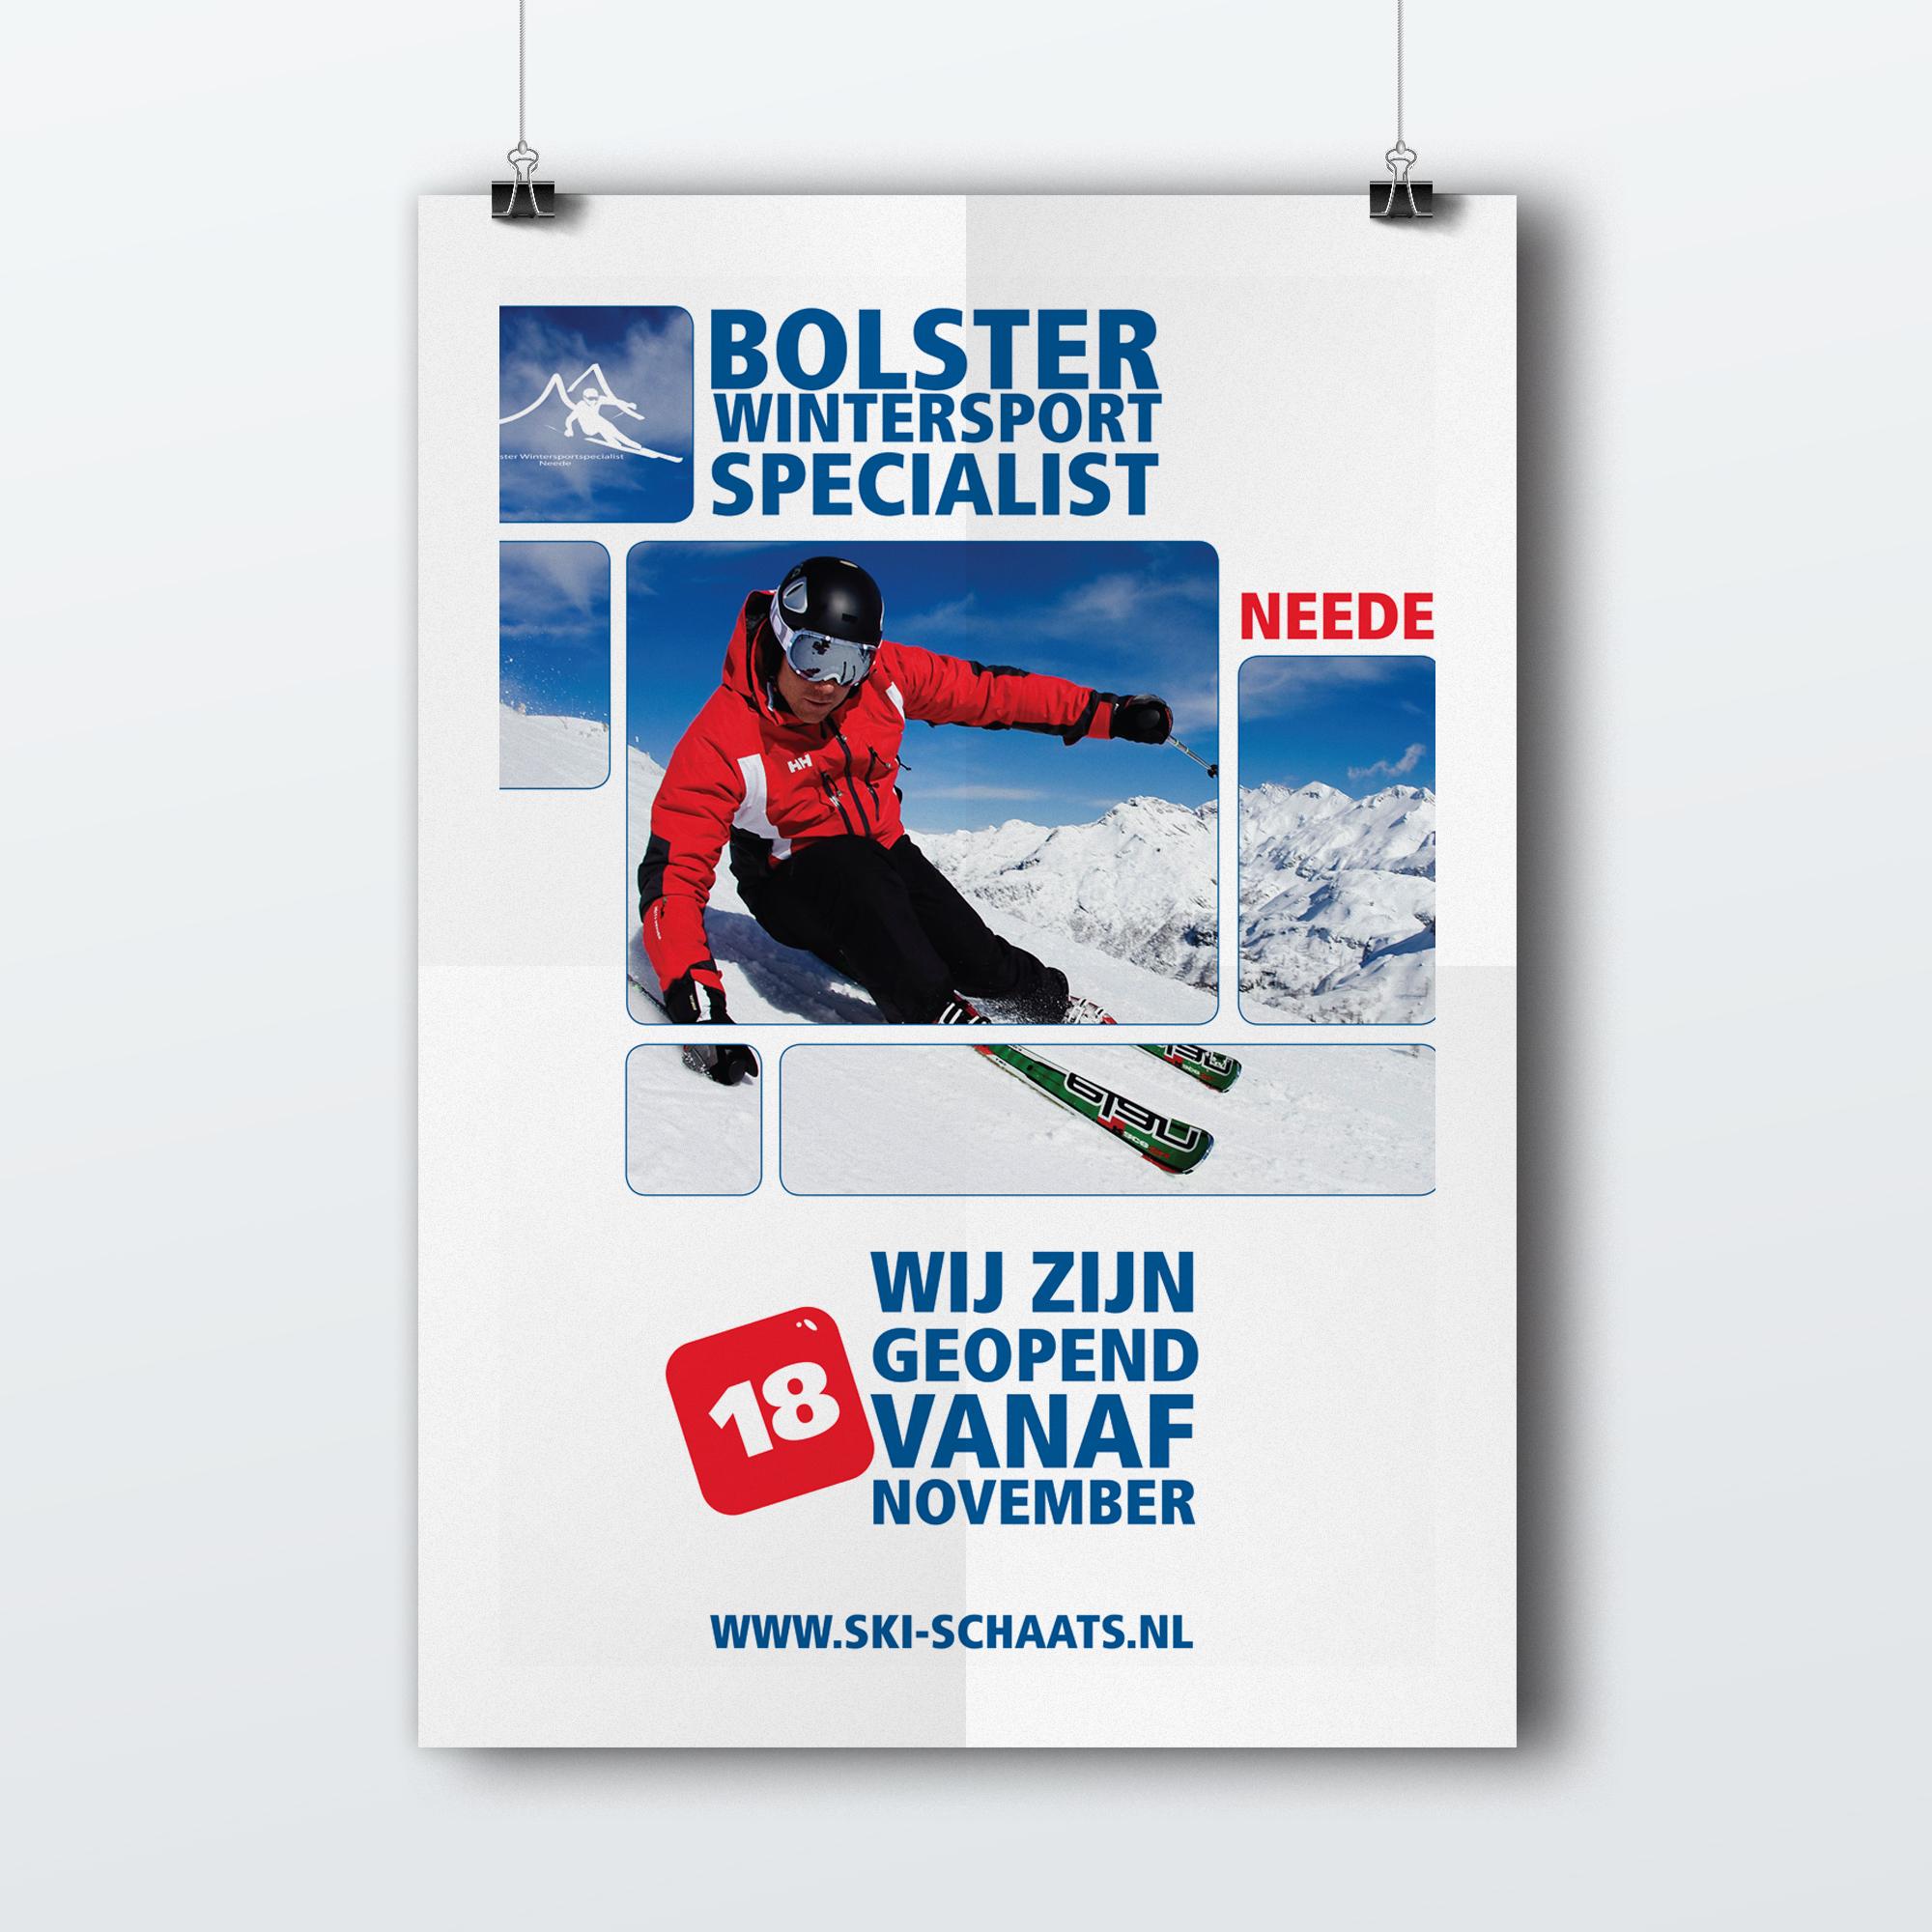 bolster_wintersport